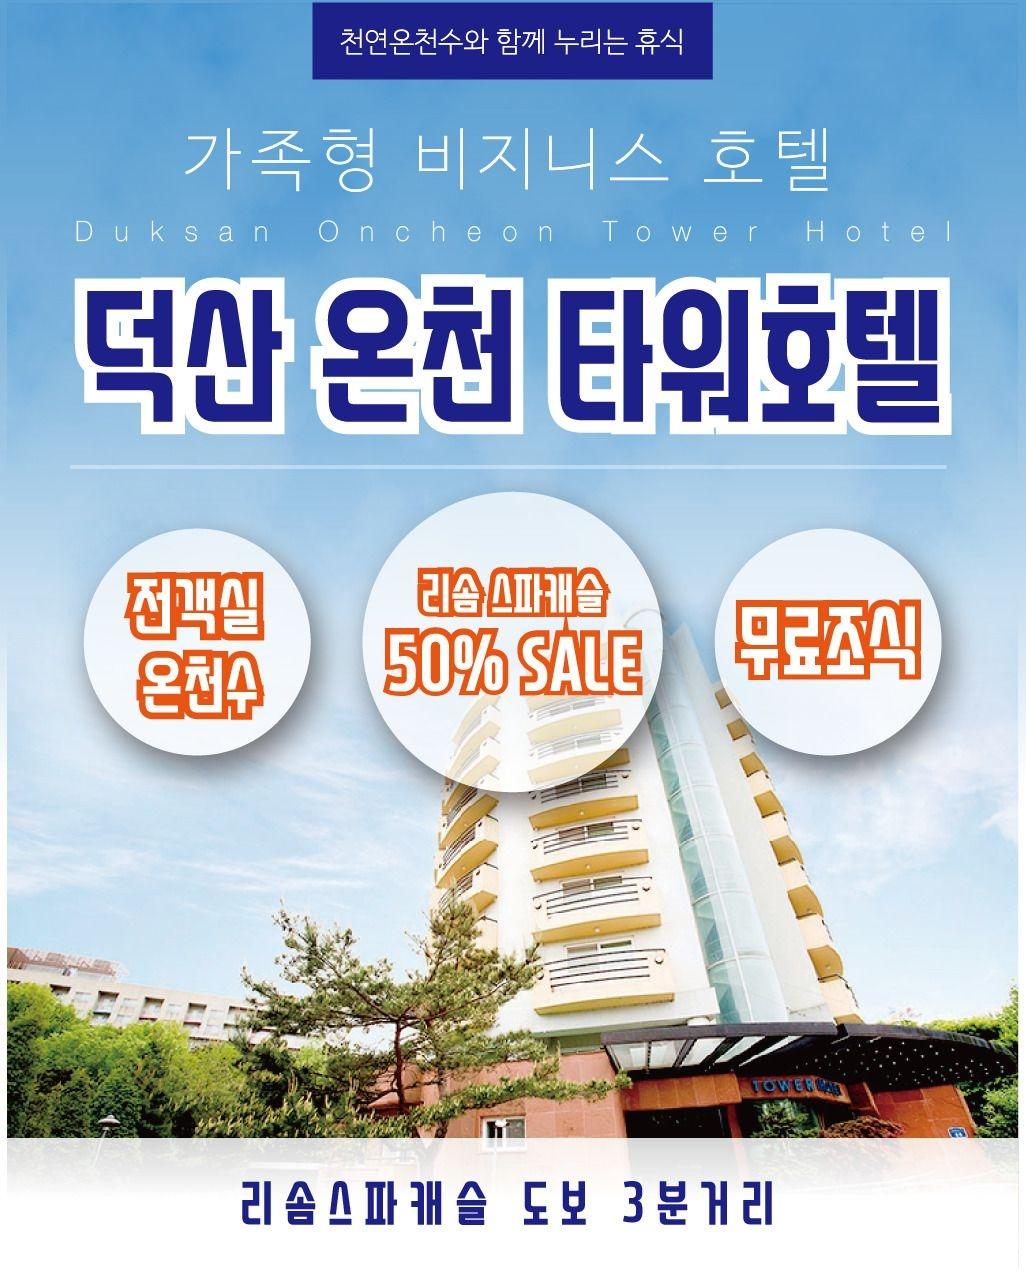 Duksan Oncheon Tower Hotel, Yesan